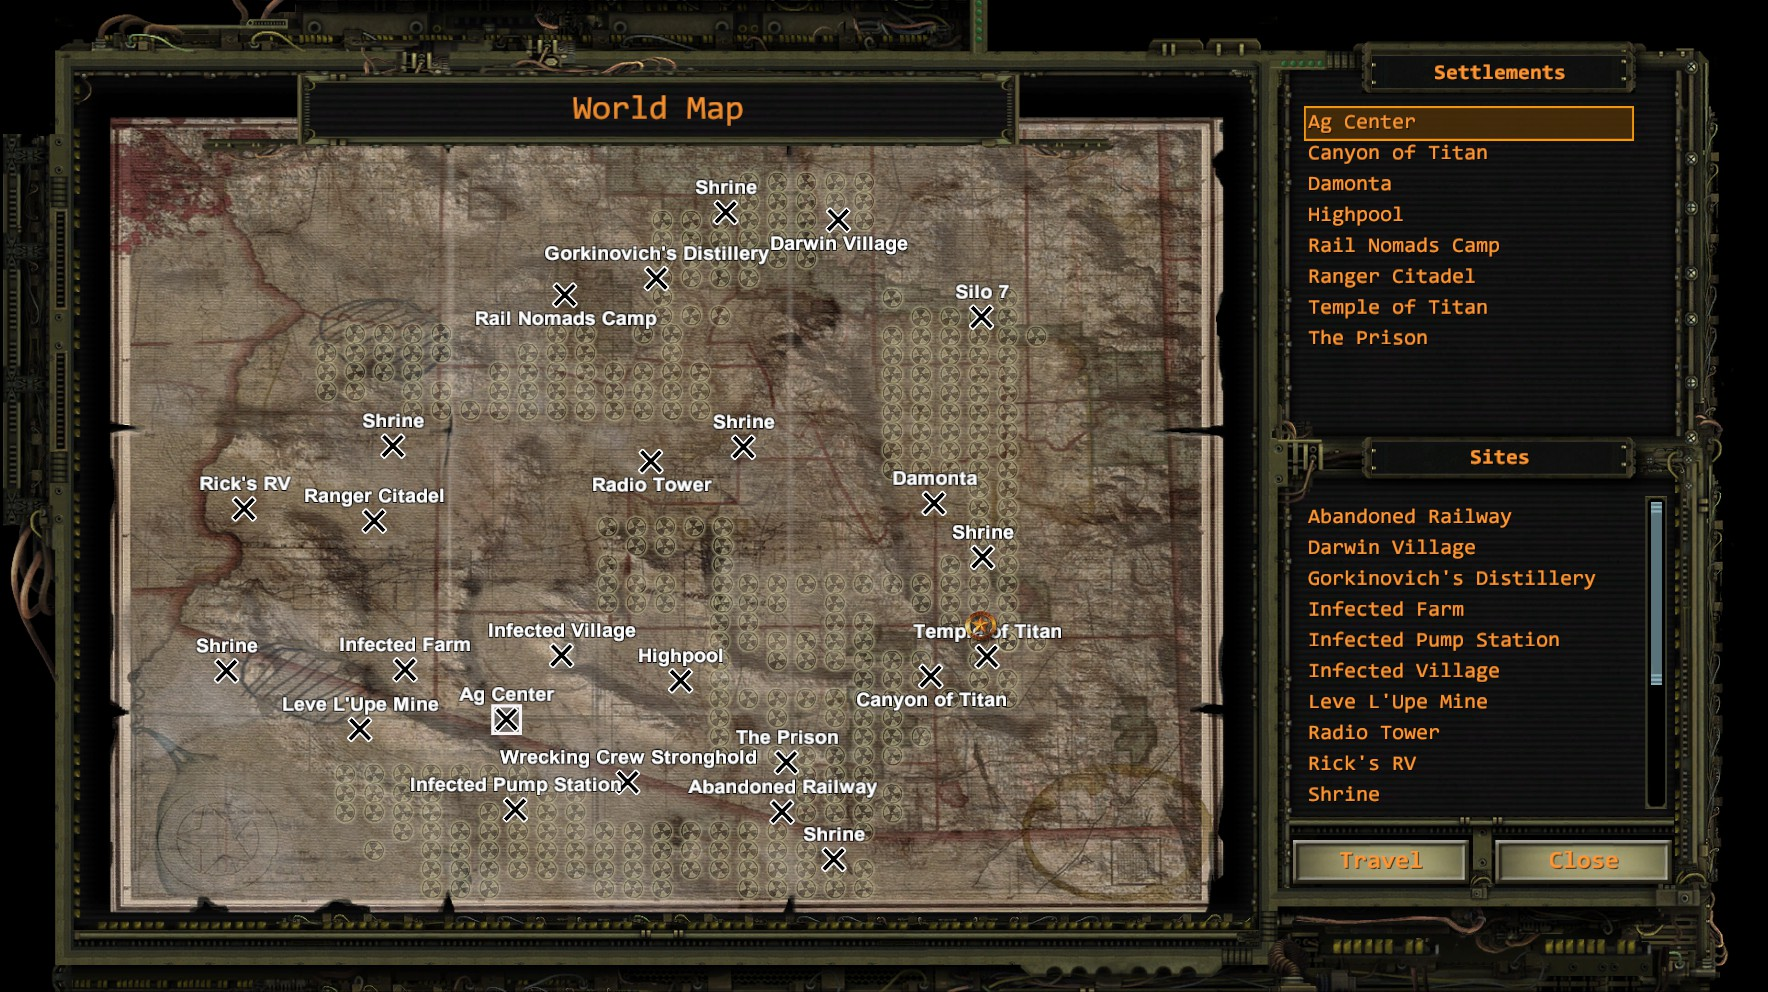 Map Of Arizona Wasteland 2.Steam Community Screenshot Wasteland 2 Arizona Map